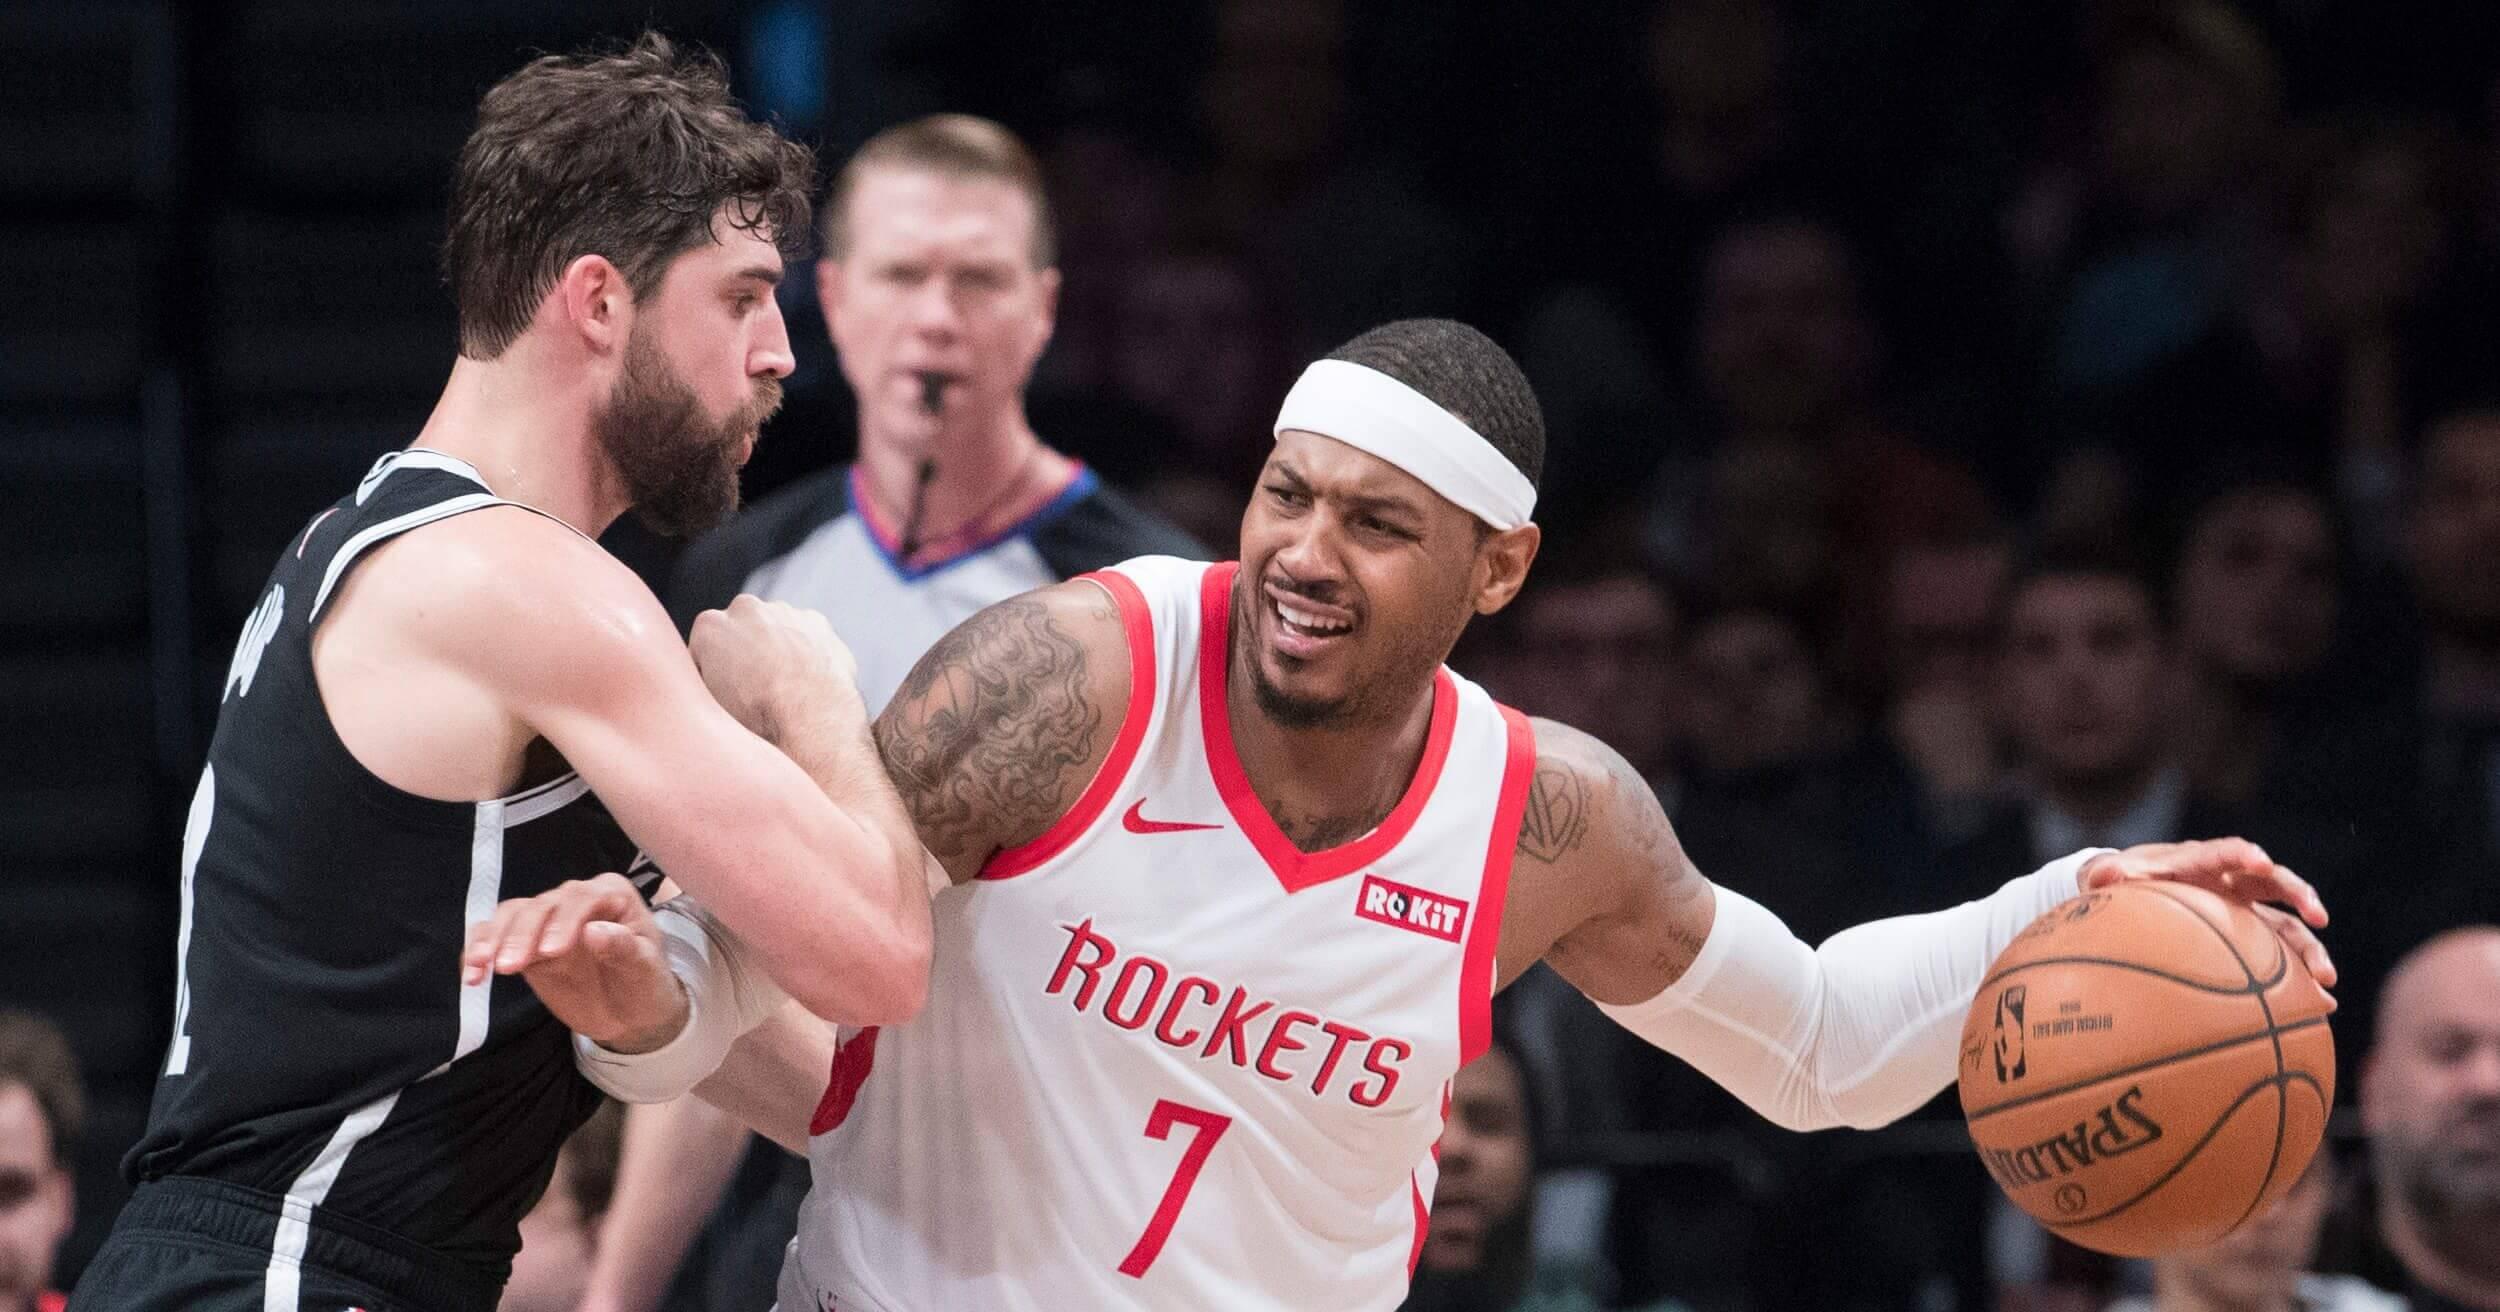 Brooklyn Nets forward Joe Harris guards Houston Rockets forward Carmelo Anthony during a Nov. 2 game in New York.